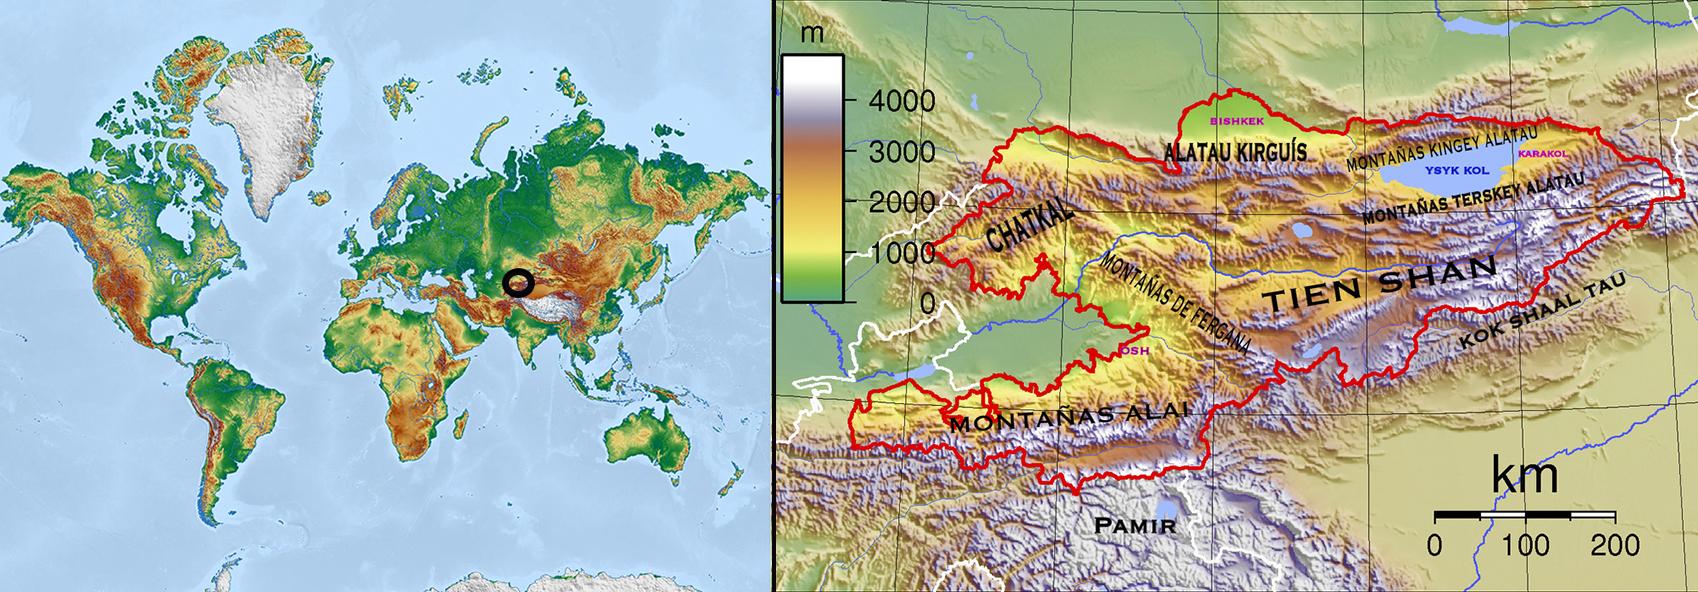 Mapa Kirguistan web-R4W